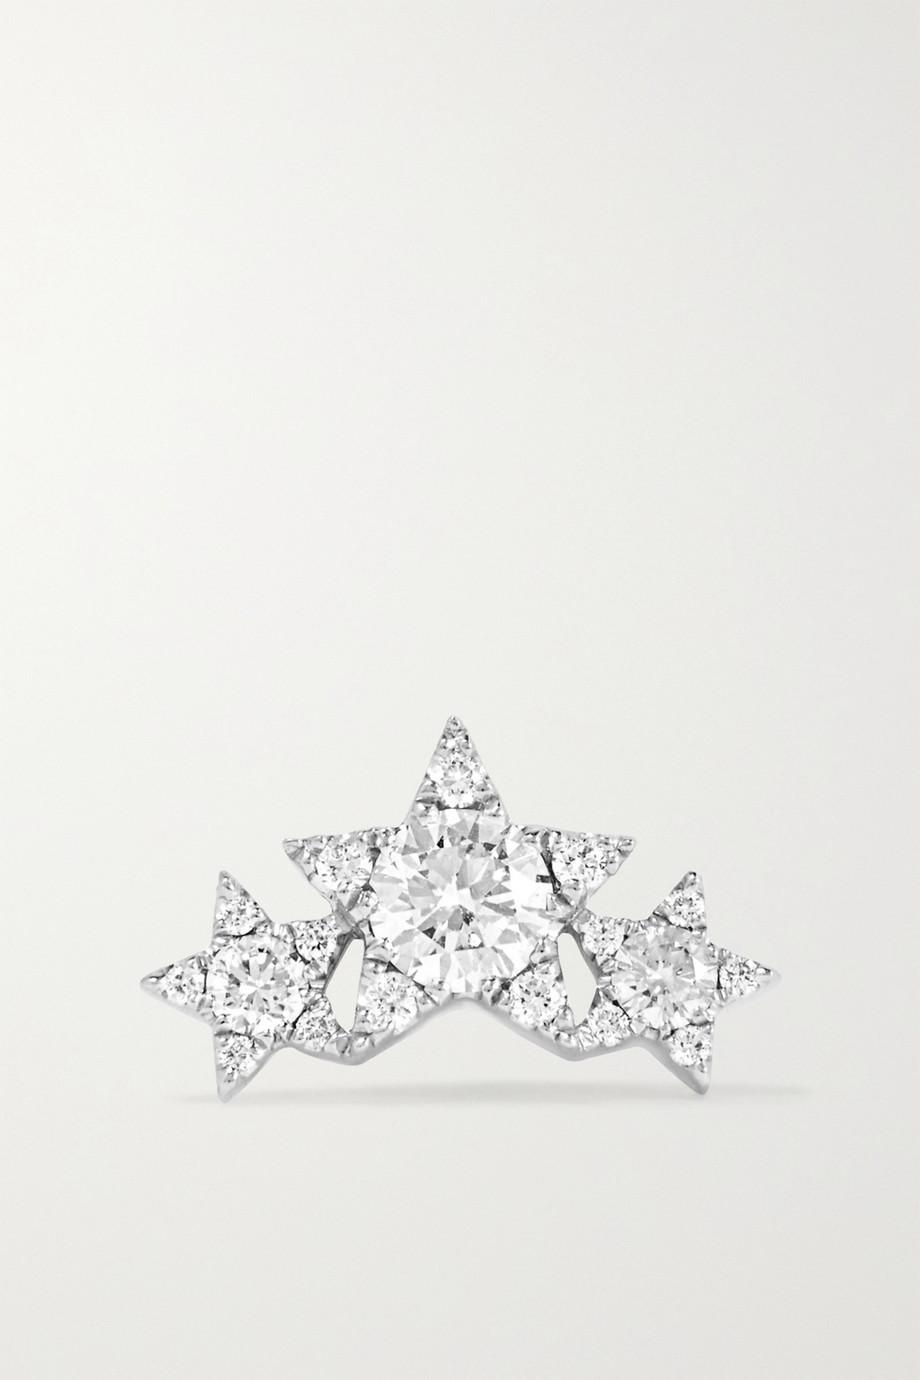 Maria Tash Star Garland 14-karat white gold diamond earring